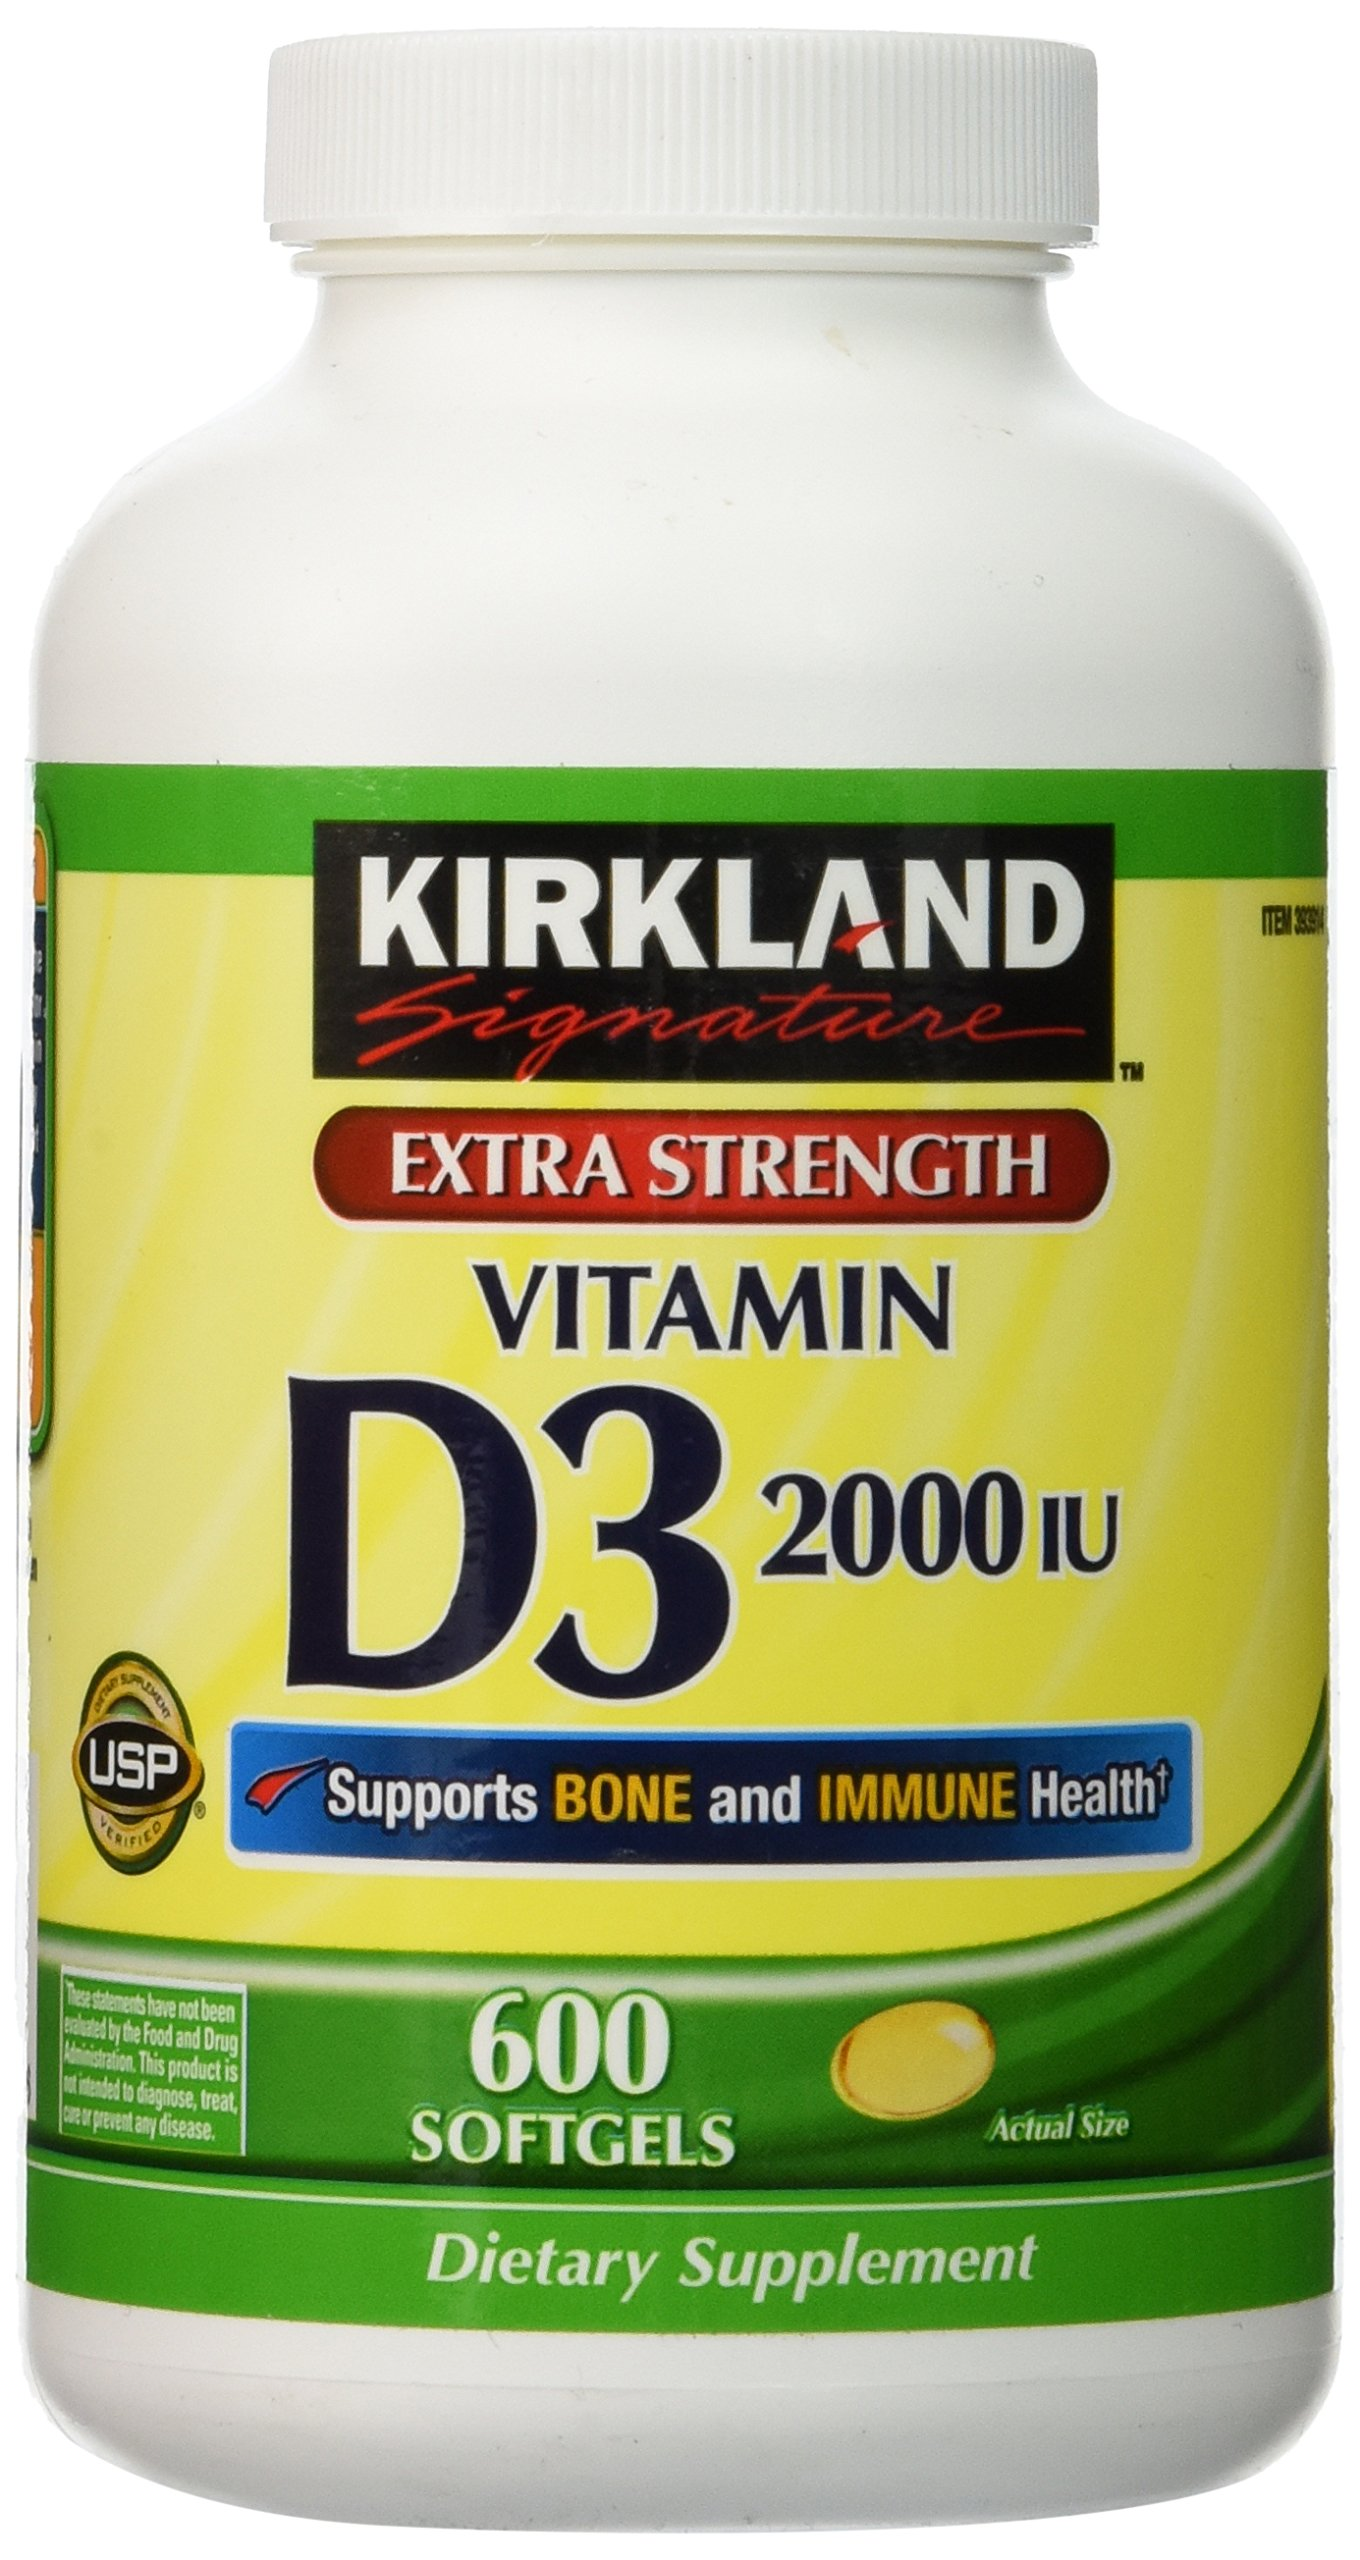 Kirkland Extra Strength Vitamin D-3 2000 IU 600 Soft Gels